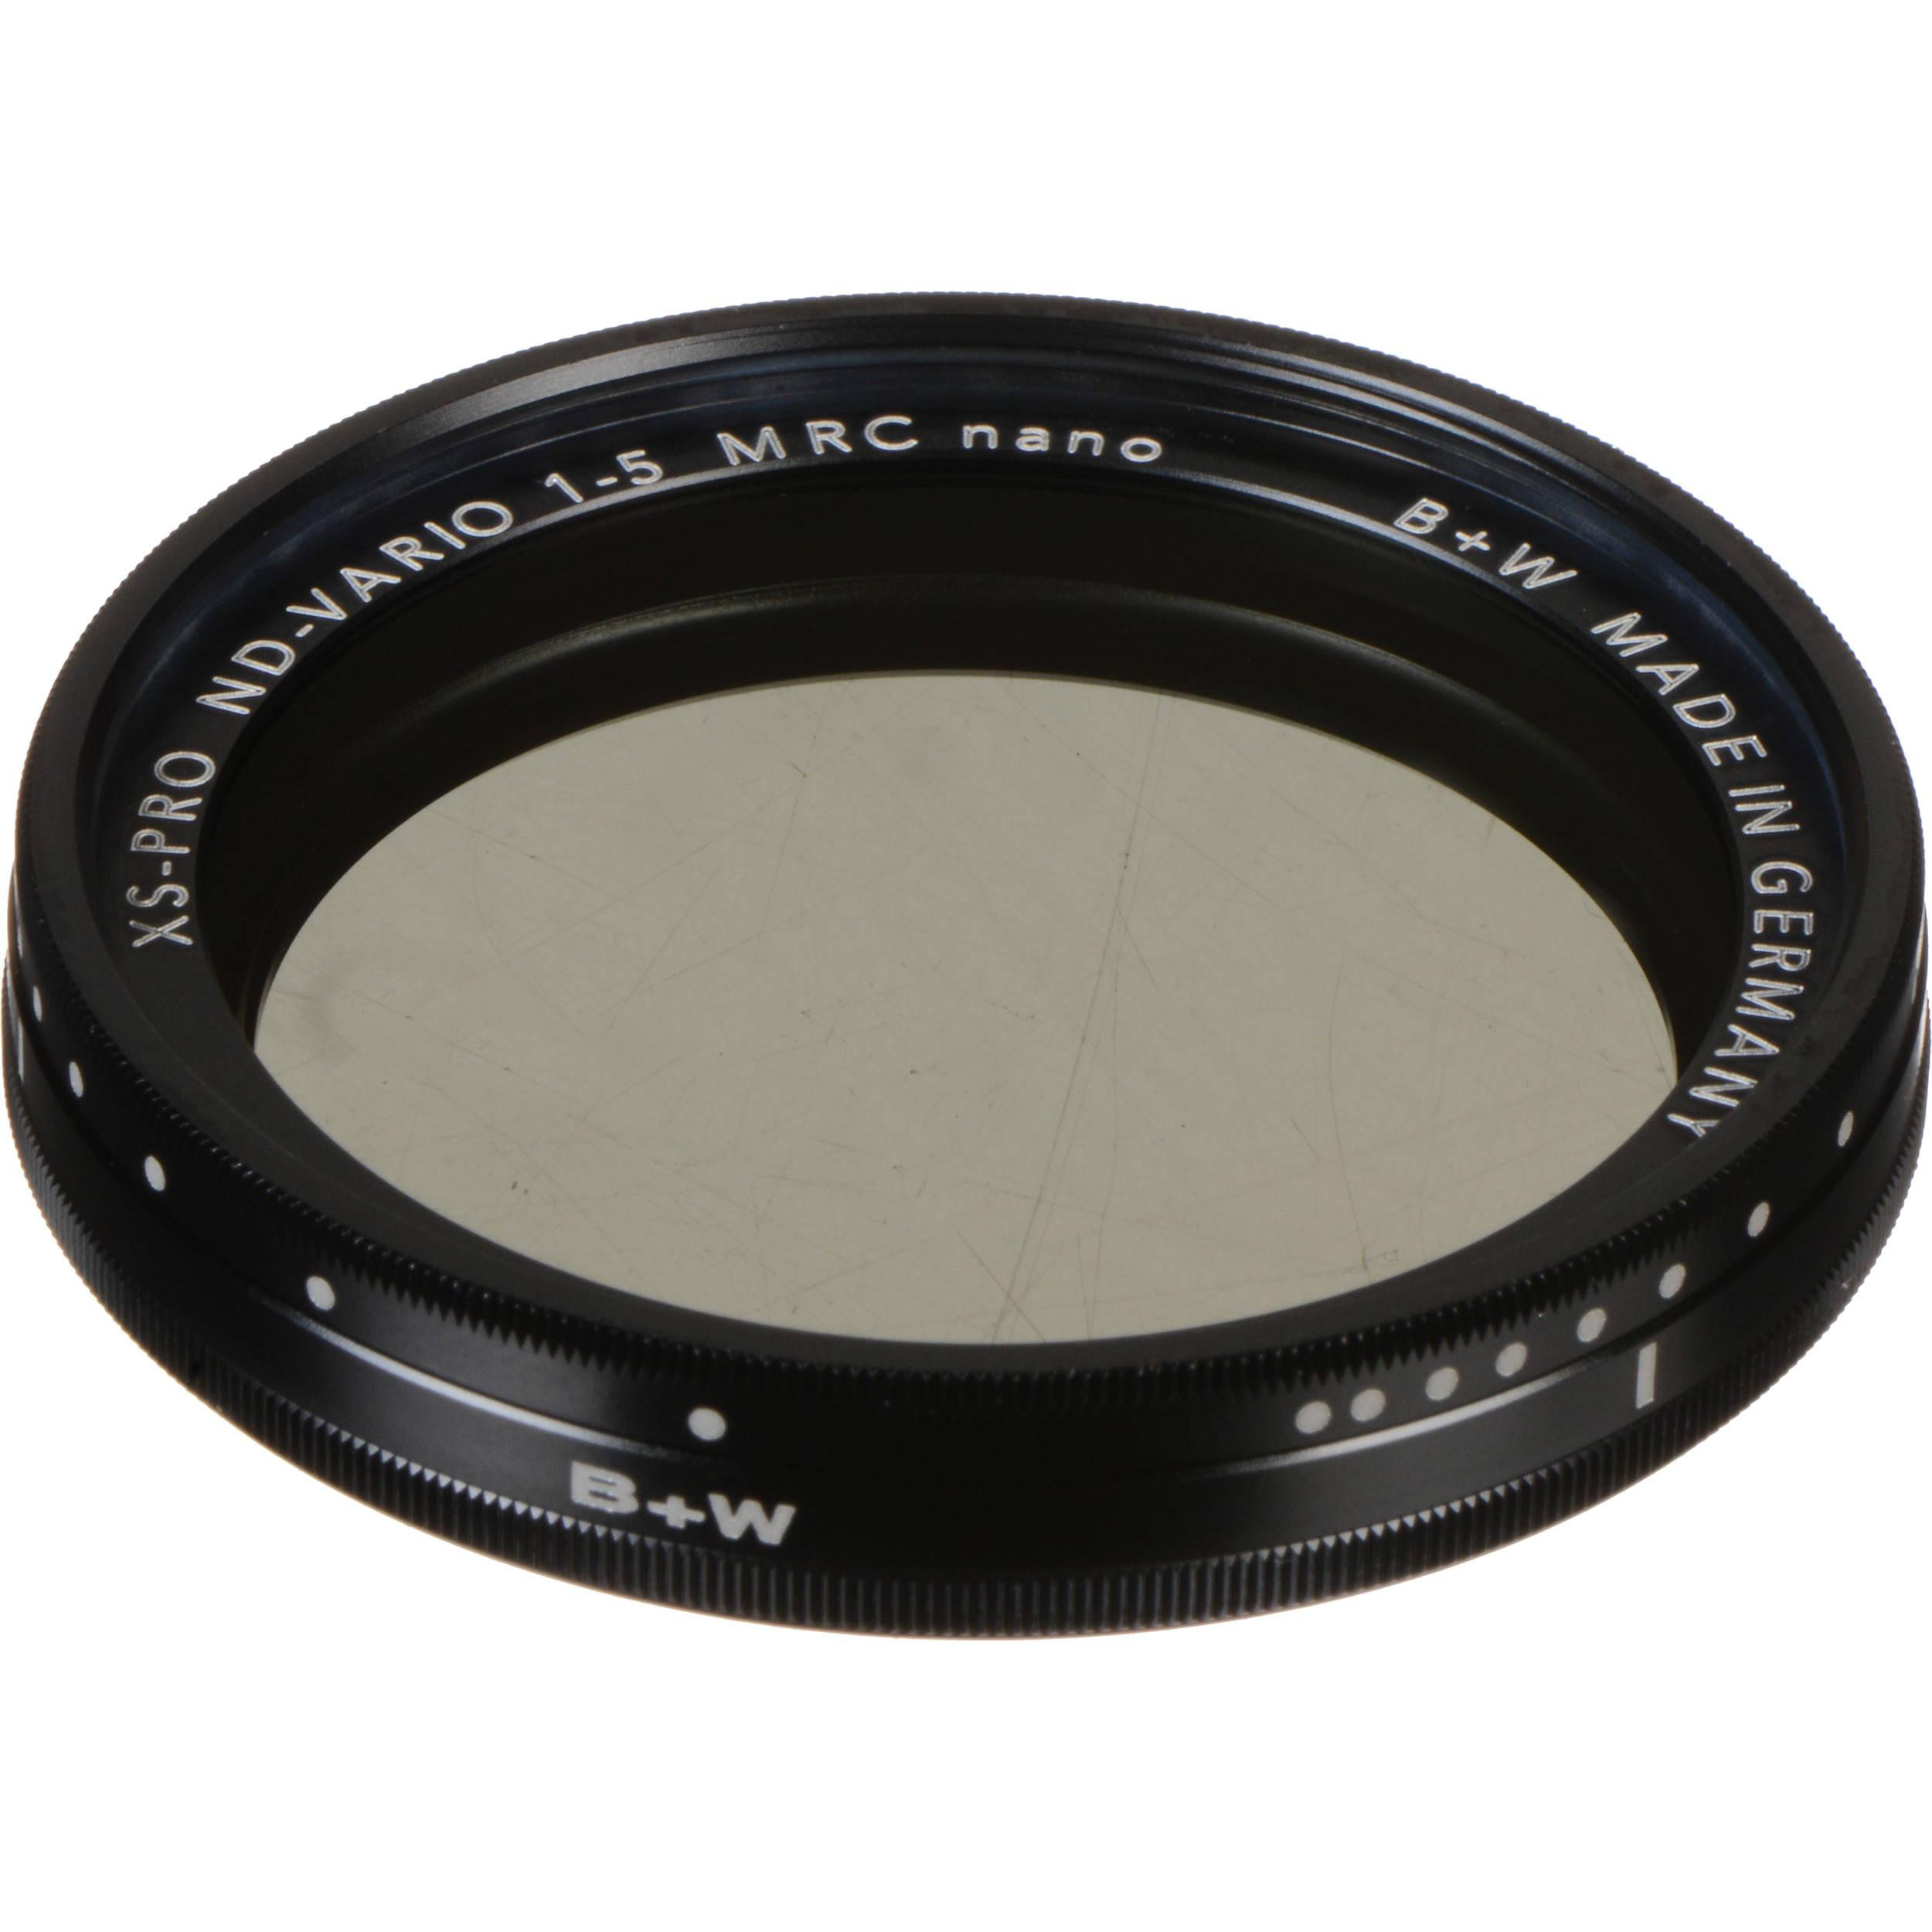 Https C Product 1140499 Reg Olympus Mzuiko Digital Ed 12 50mm F35 63 Ez Lens B W 1082202 46mm Xs Pro Nano Mc Nd Vario 1141529